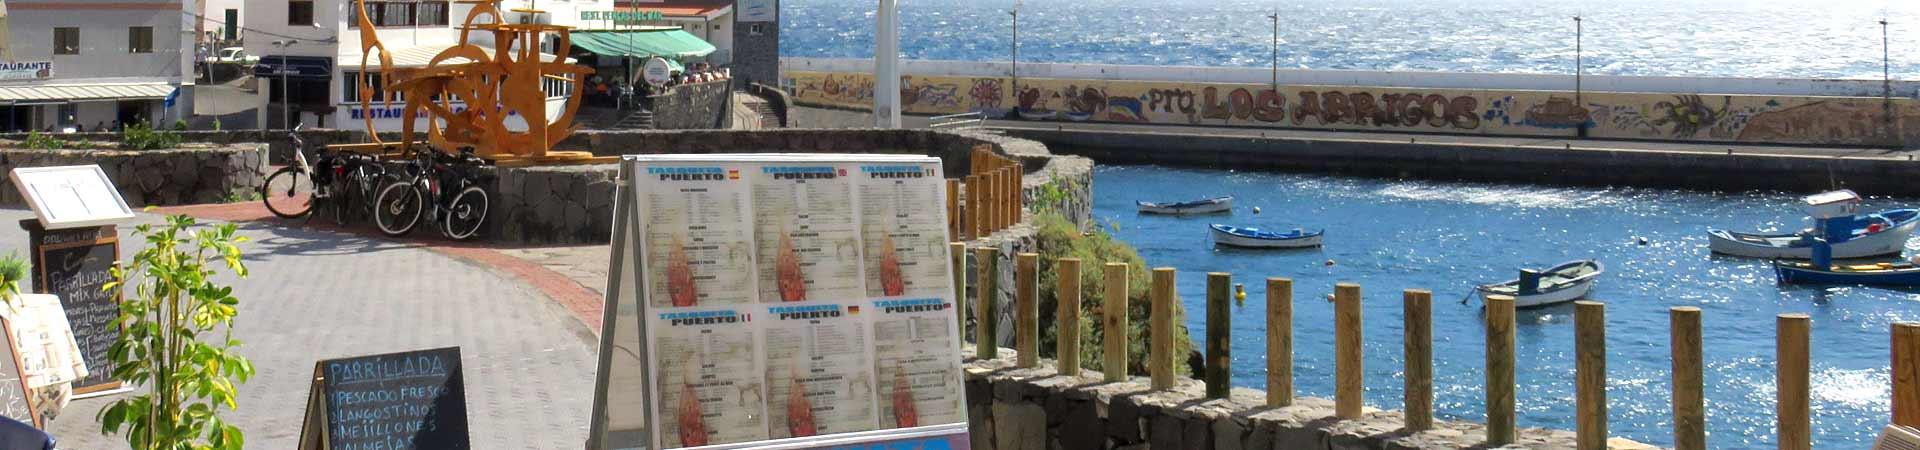 https://www.goodmorningtenerife.com/wp-content/uploads/2015/02/02_tasquita-del-puerto_slide-1920x450.jpg